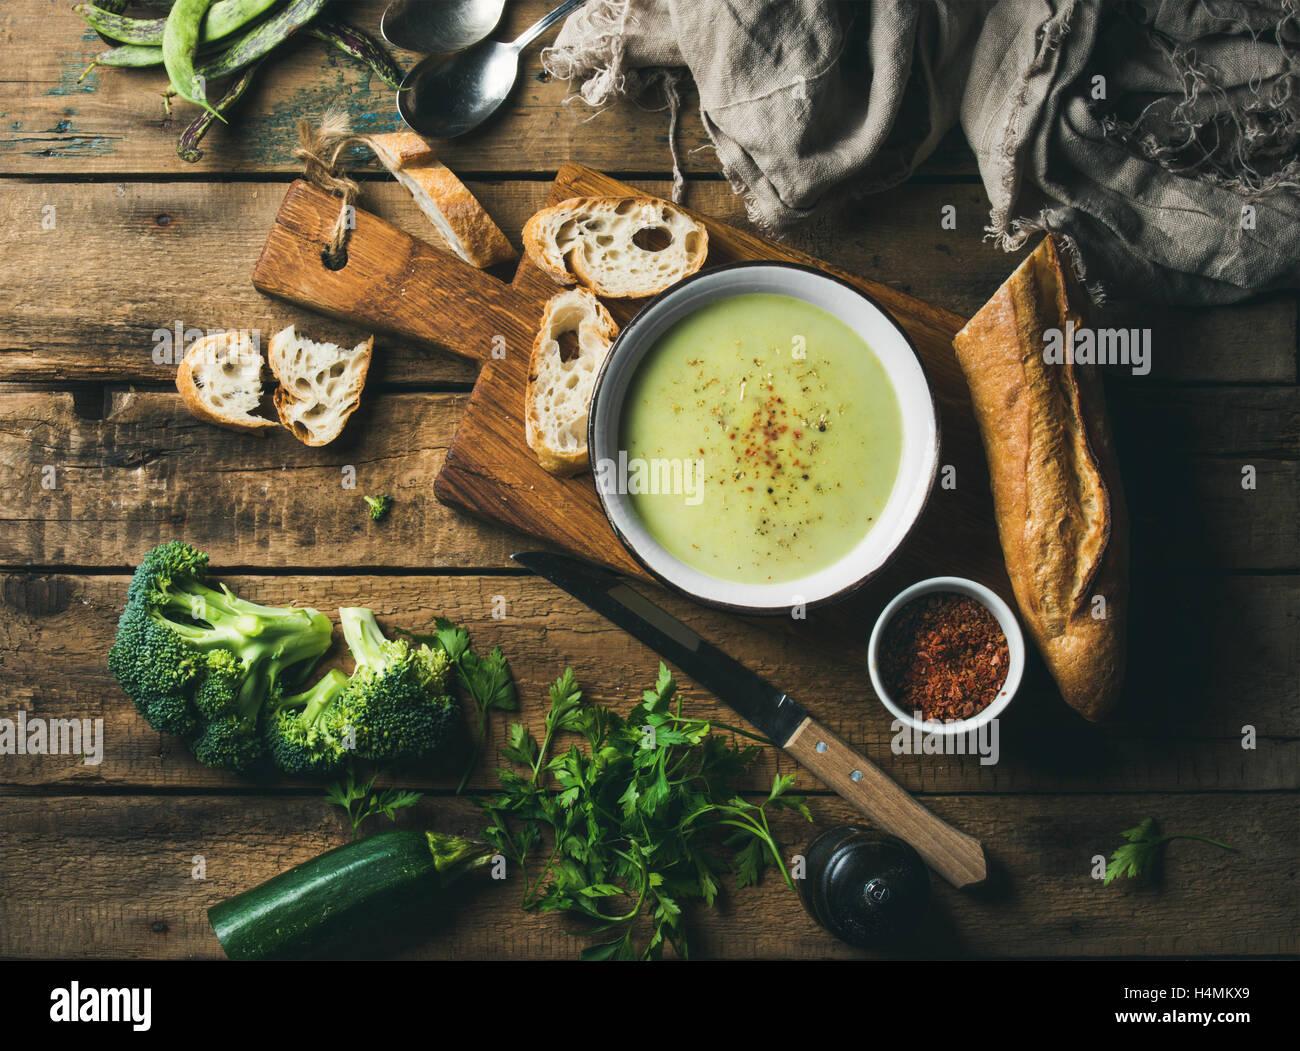 Homemade pea, broccoli, zucchini cream soup with fresh baguette - Stock Image